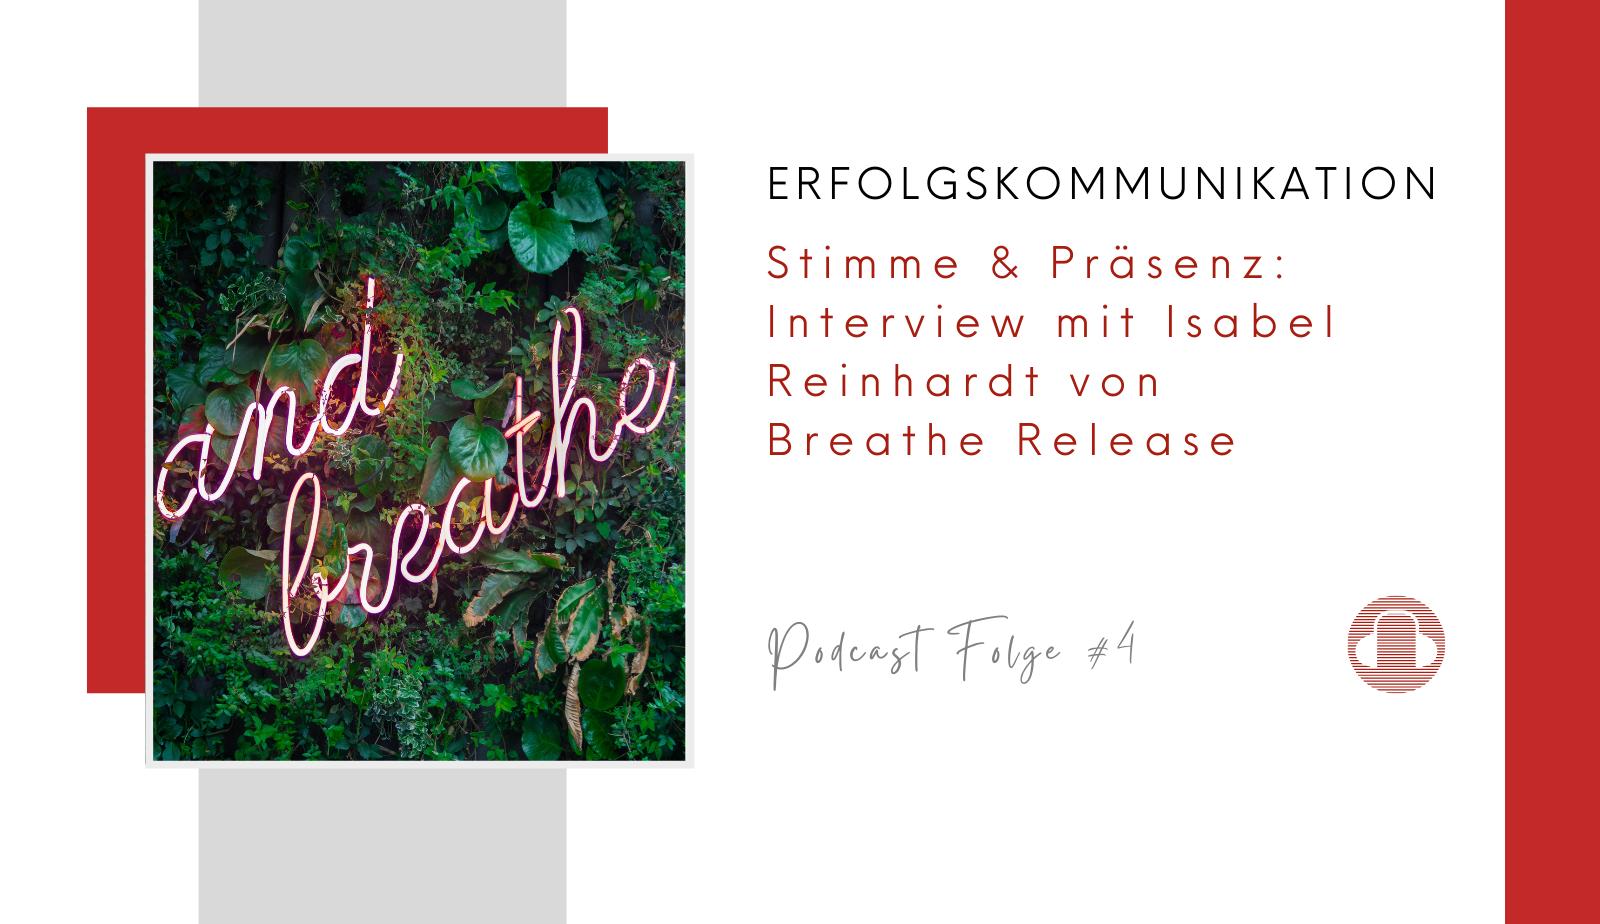 Erfolgkommunikation-Podcast-Stimme-Praesenz-Isabel-Reinhardt